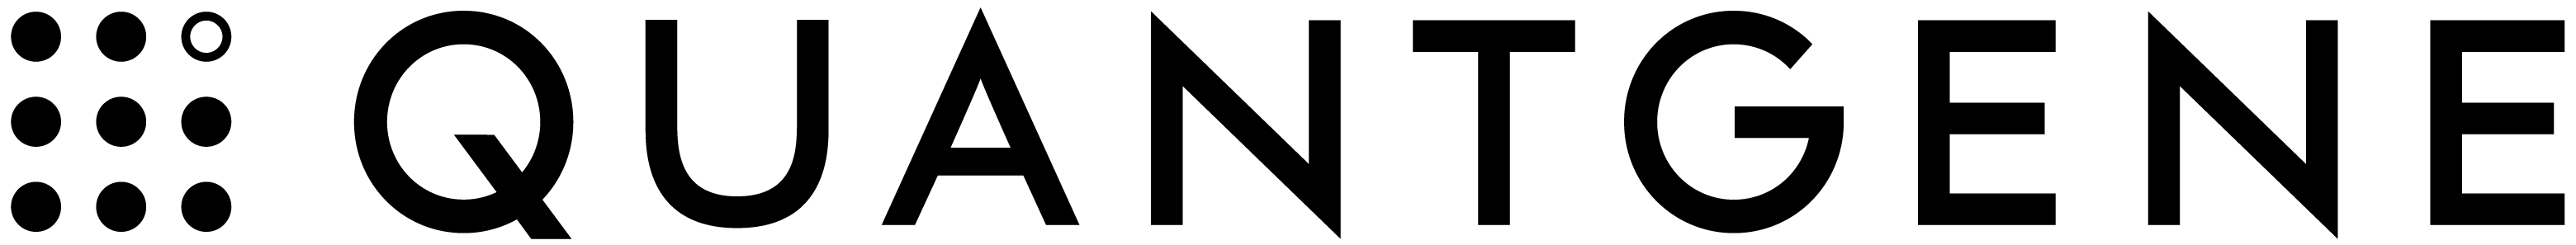 Quantgene logo